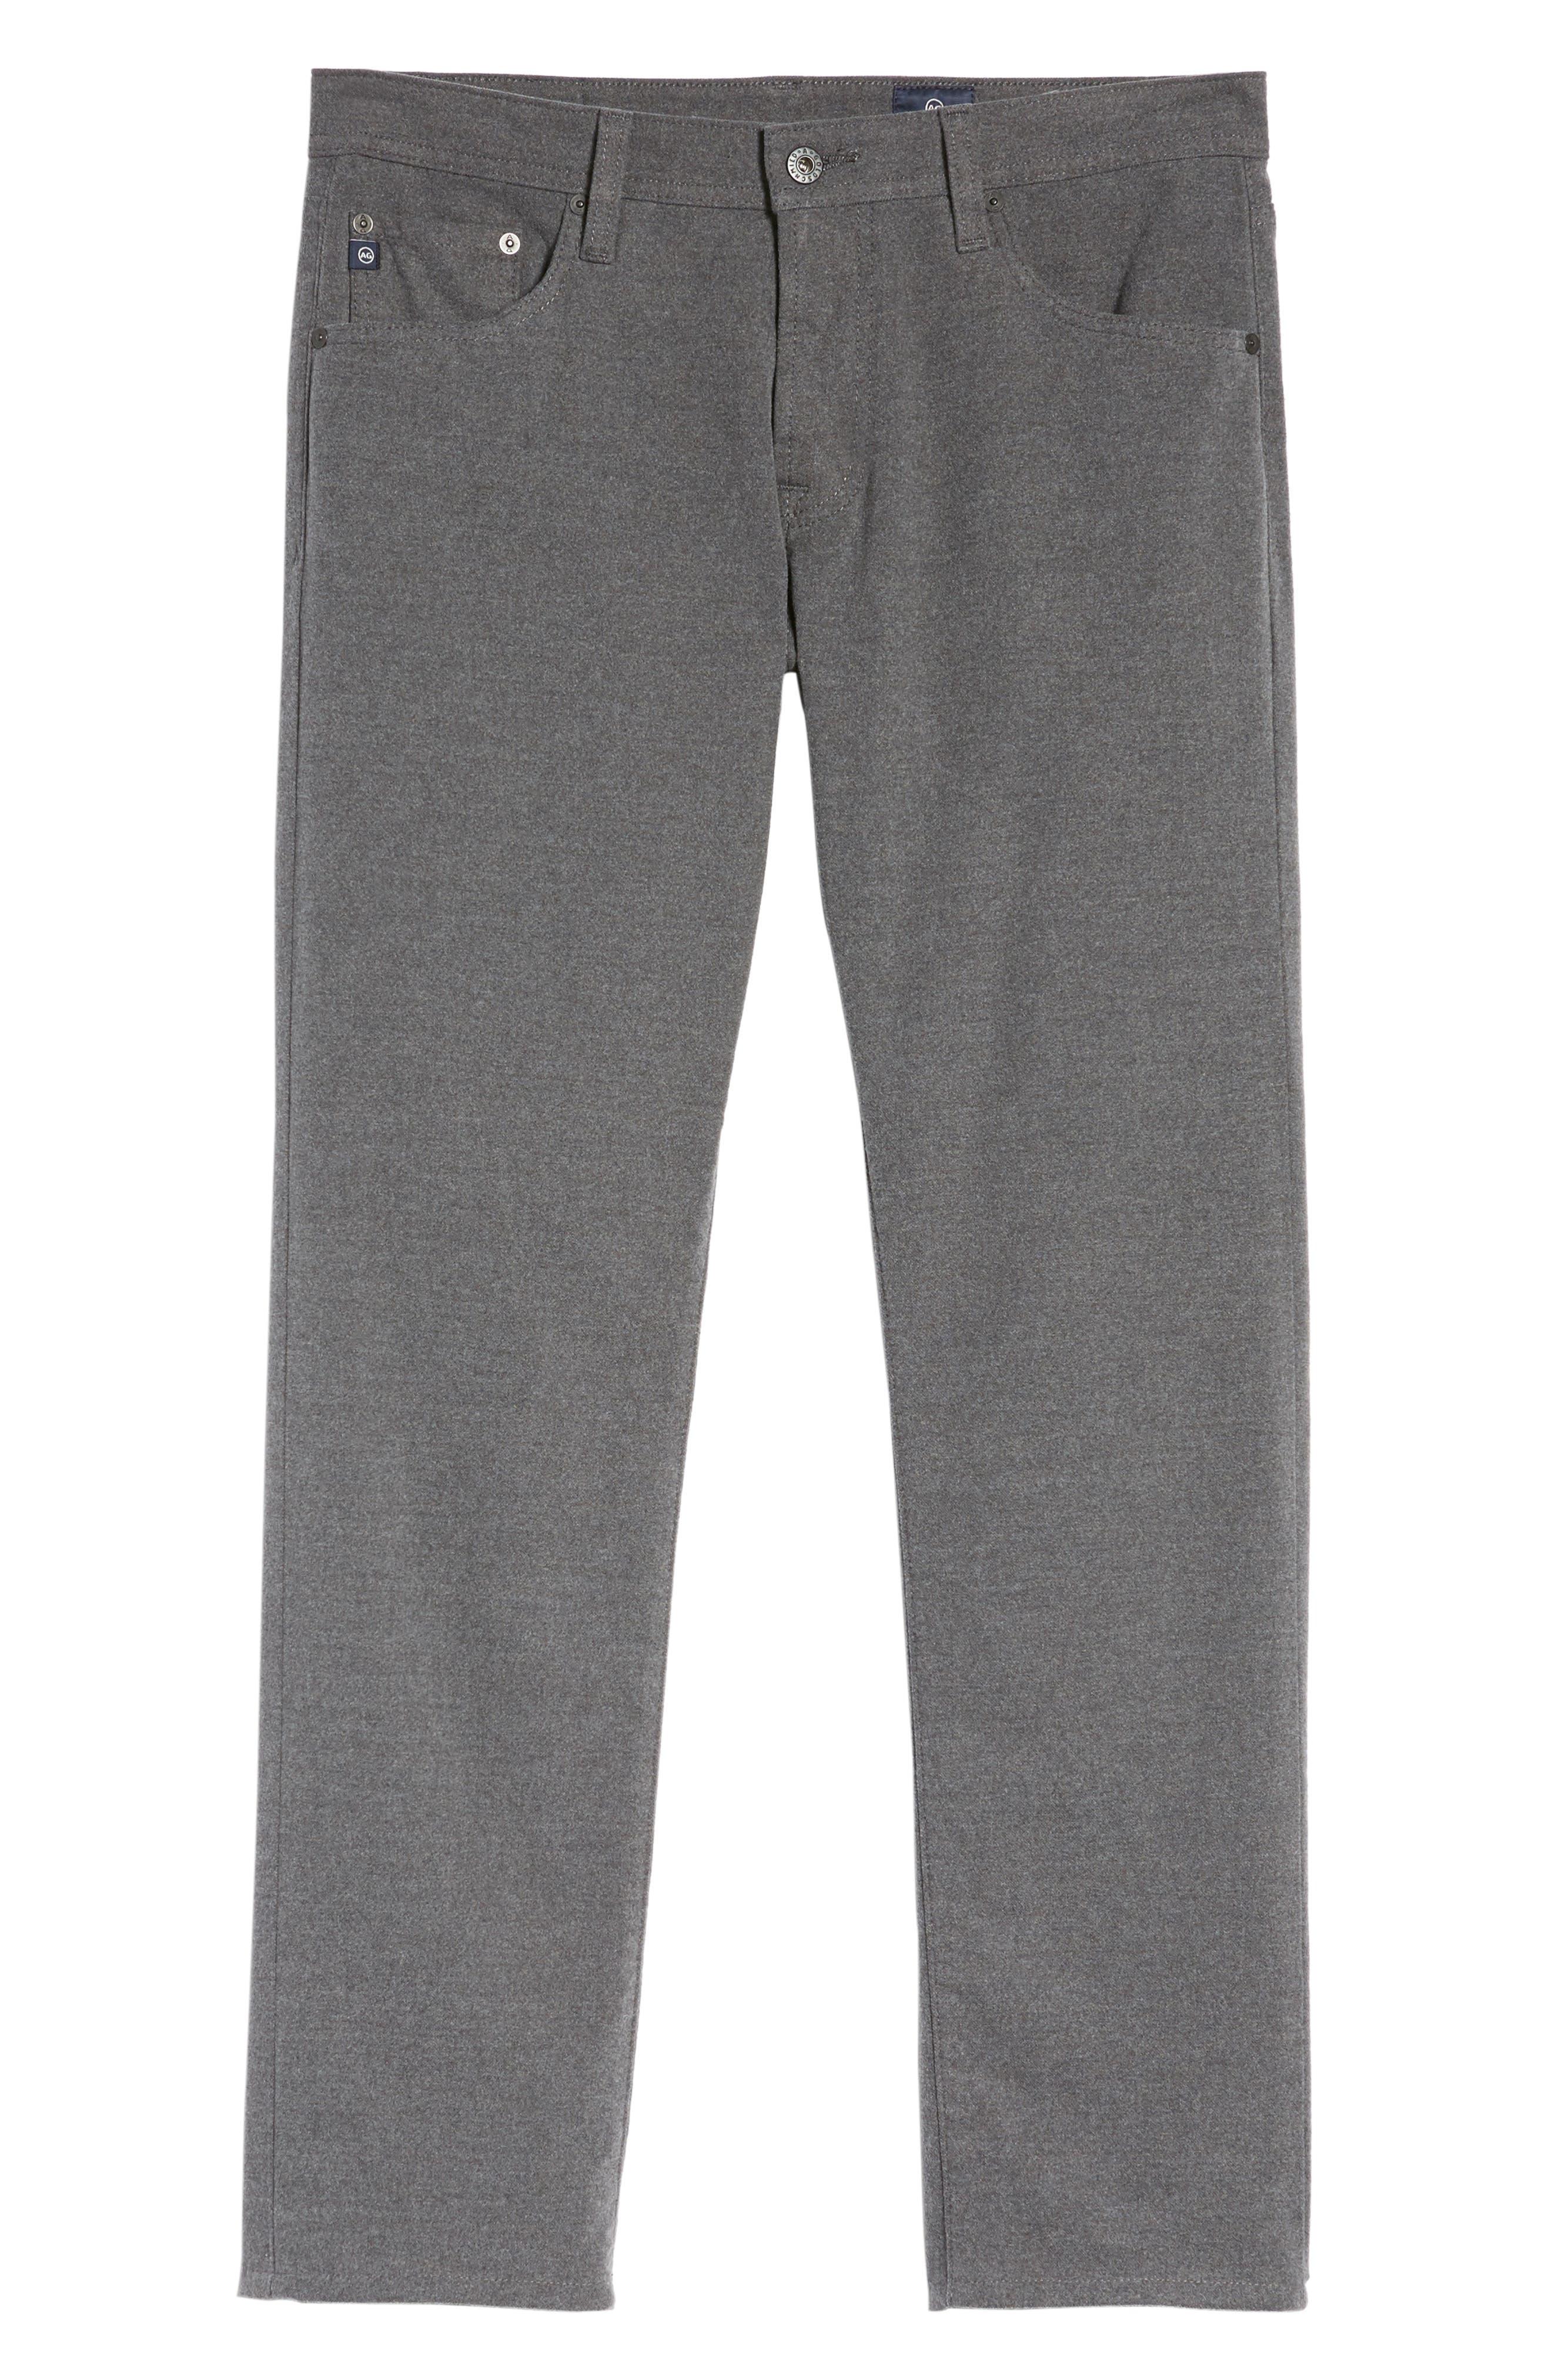 Marshall Slim Fit Pinstripe Pants,                             Alternate thumbnail 6, color,                             028